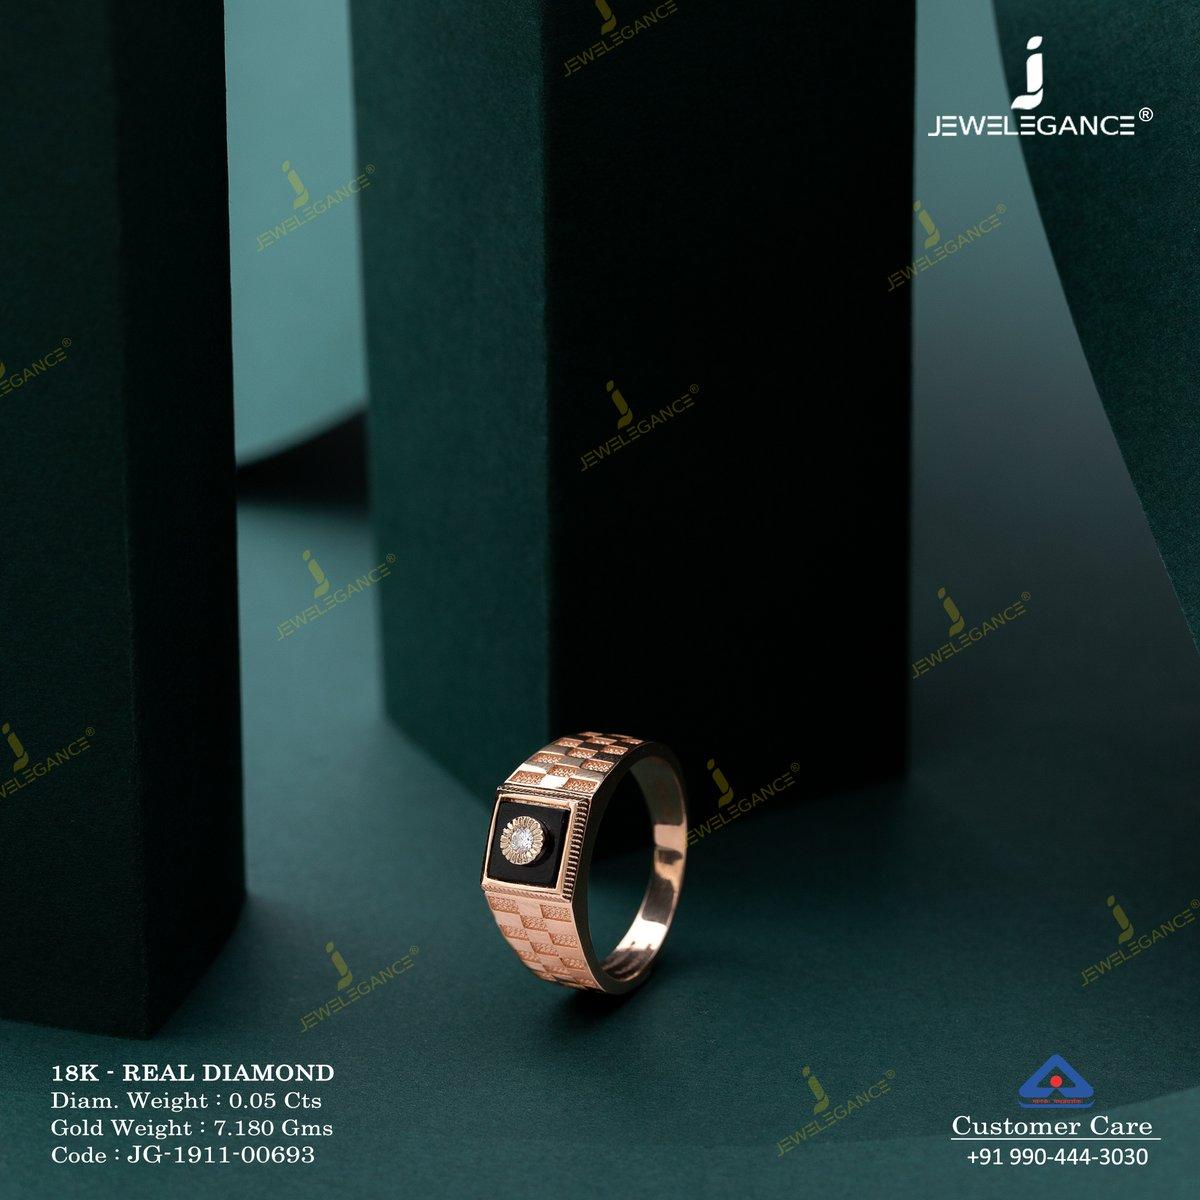 Make your bond special with diamond ring... . #Shop on: https://www.jewelegance.com/product-detail/3384… . #myjewelegance #goldjewellery #jewellery  #jotd  #ring  #goldring #engagementring #lastesttrend #ringoftheday #diamondring #lovefordiamonds #mensfashion #mensjewellerypic.twitter.com/K8UioEpSml